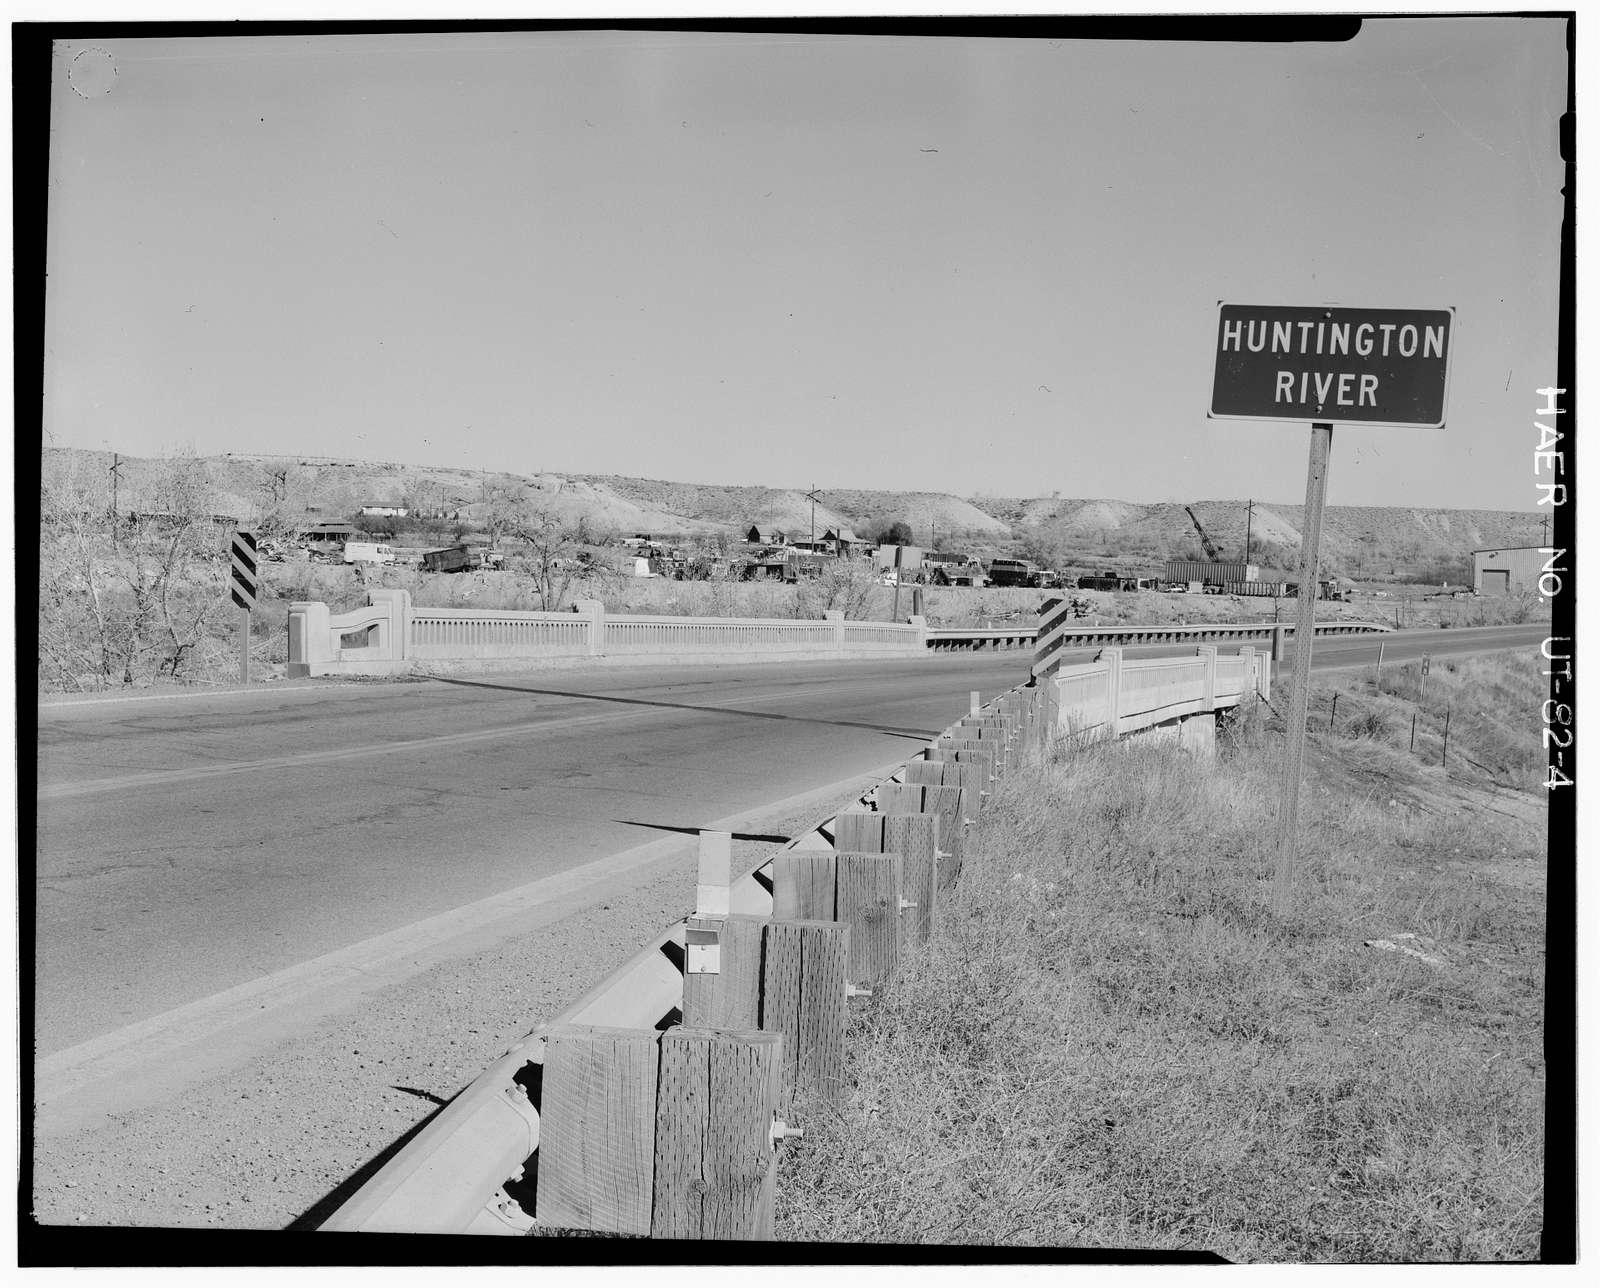 Huntington Creek Bridge, Spanning Huntington Creek at State Route 10, Huntington, Emery County, UT